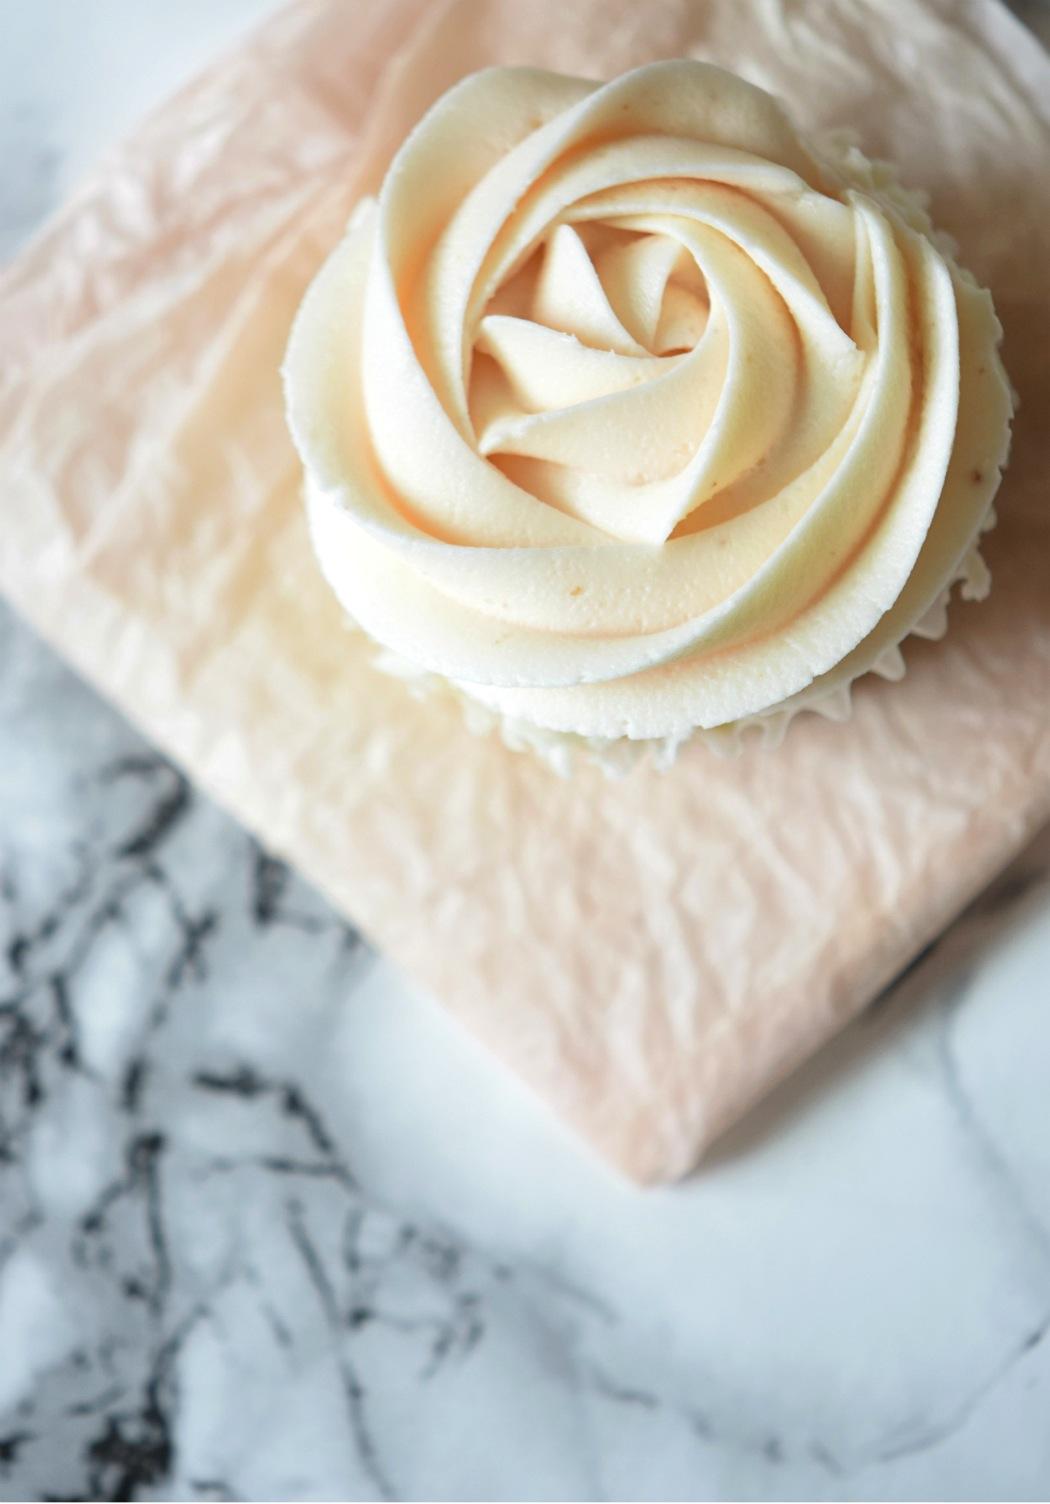 the urban umbrella style blog, vancouver style blog, vancouver fashion blog, vancouver lifestyle blog, vancouver health blog, vancouver fitness blog, vancouver travel blog, canadian faashion blog, canadian style blog, canadian lifestyle blog, canadian health blog, canadian fitness blog, canadian travel blog, bree aylwin, easy cupcake recipe, wedding cupcake recipe, diy wedding cupcakes, blush pink icing recipe, delicious and easy cupcake recipe, best fitness blogs, best health blogs, best travel blogs, top fashion blogs, top style blogs, top lifestyle blogs, top fitness blogs, top health blogs, top travel blogs